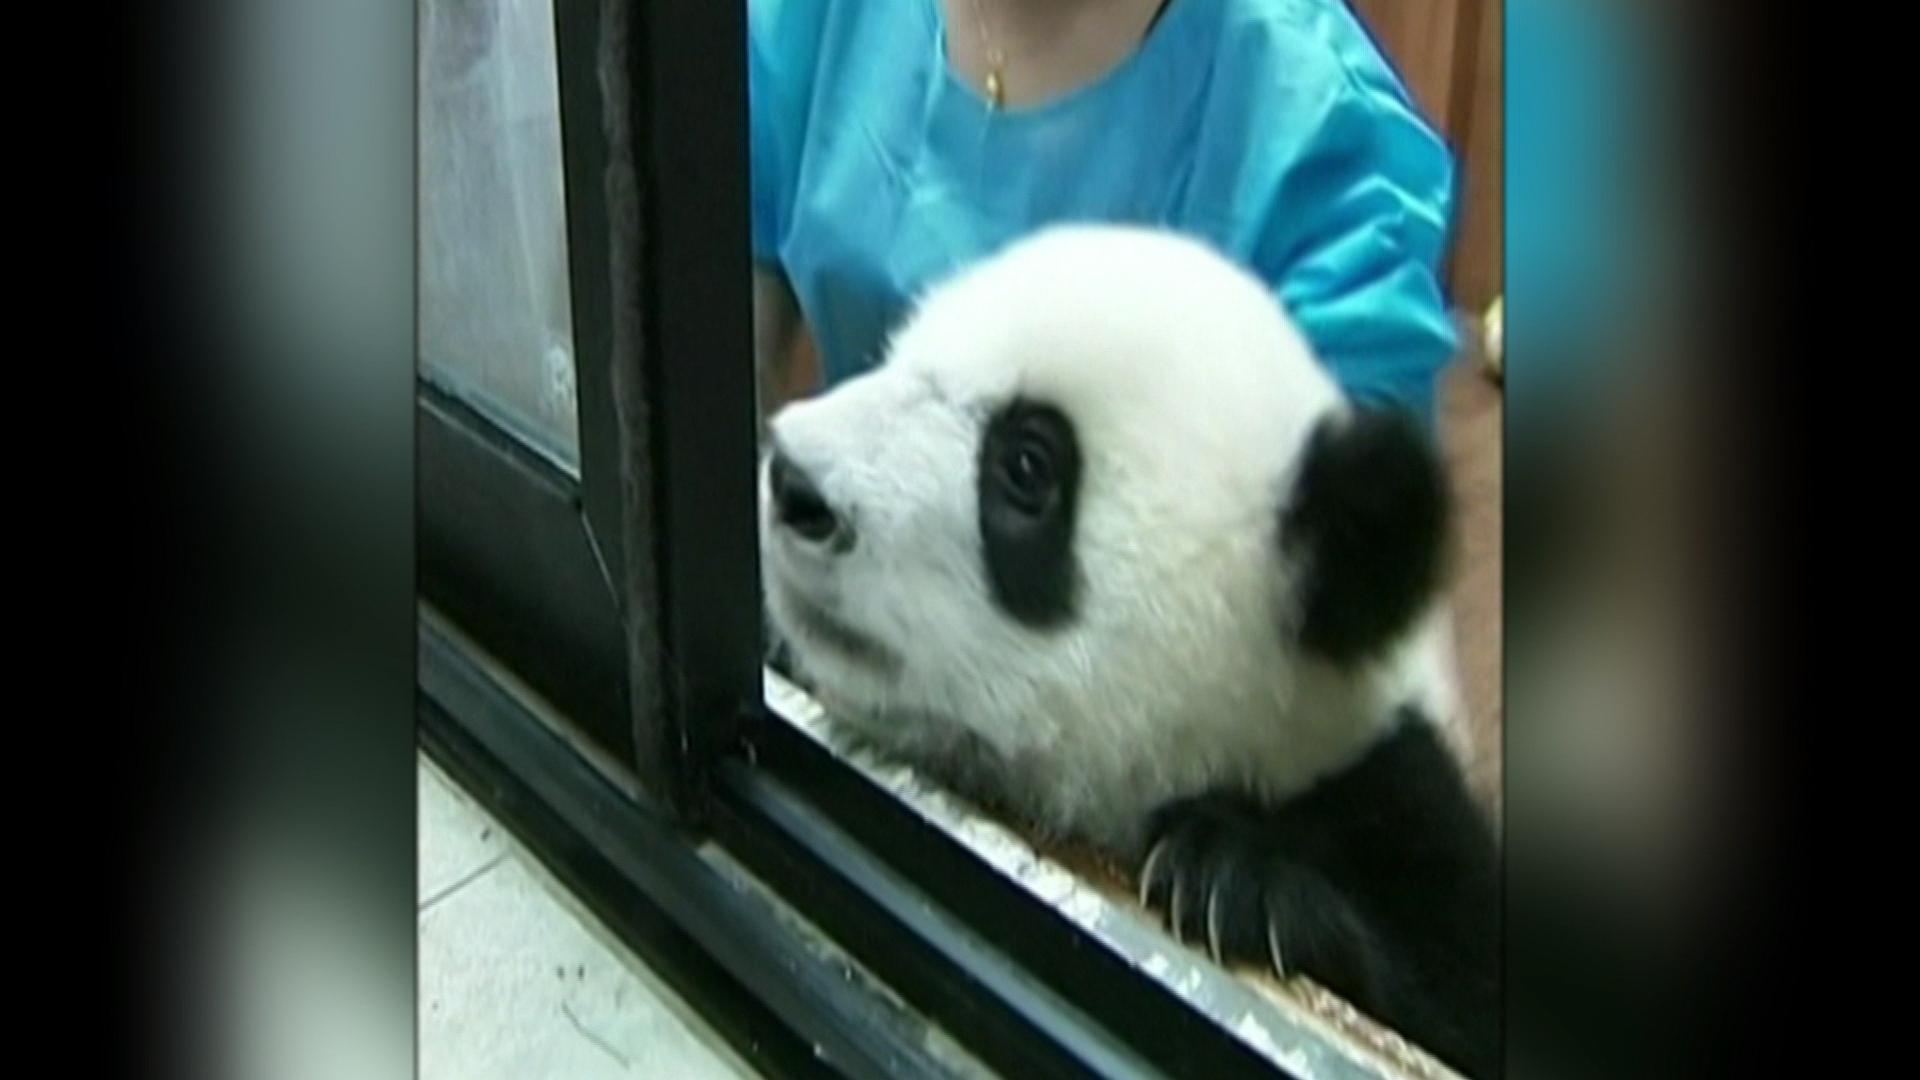 Panda cubs frolic at China research center